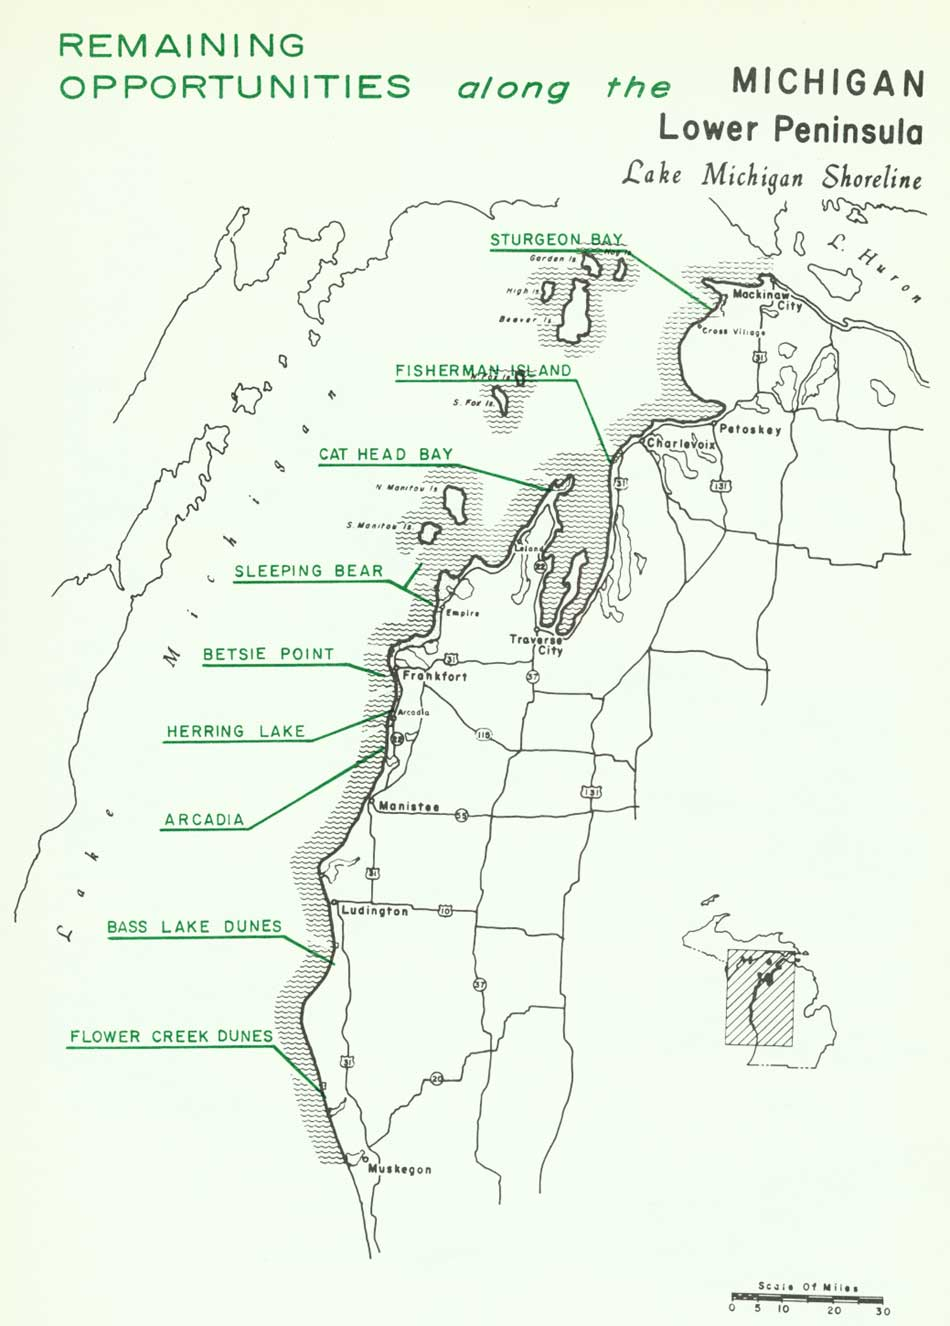 National Park Service Great Lakes Shoreline Recreation Area Survey - Michigan coastline map